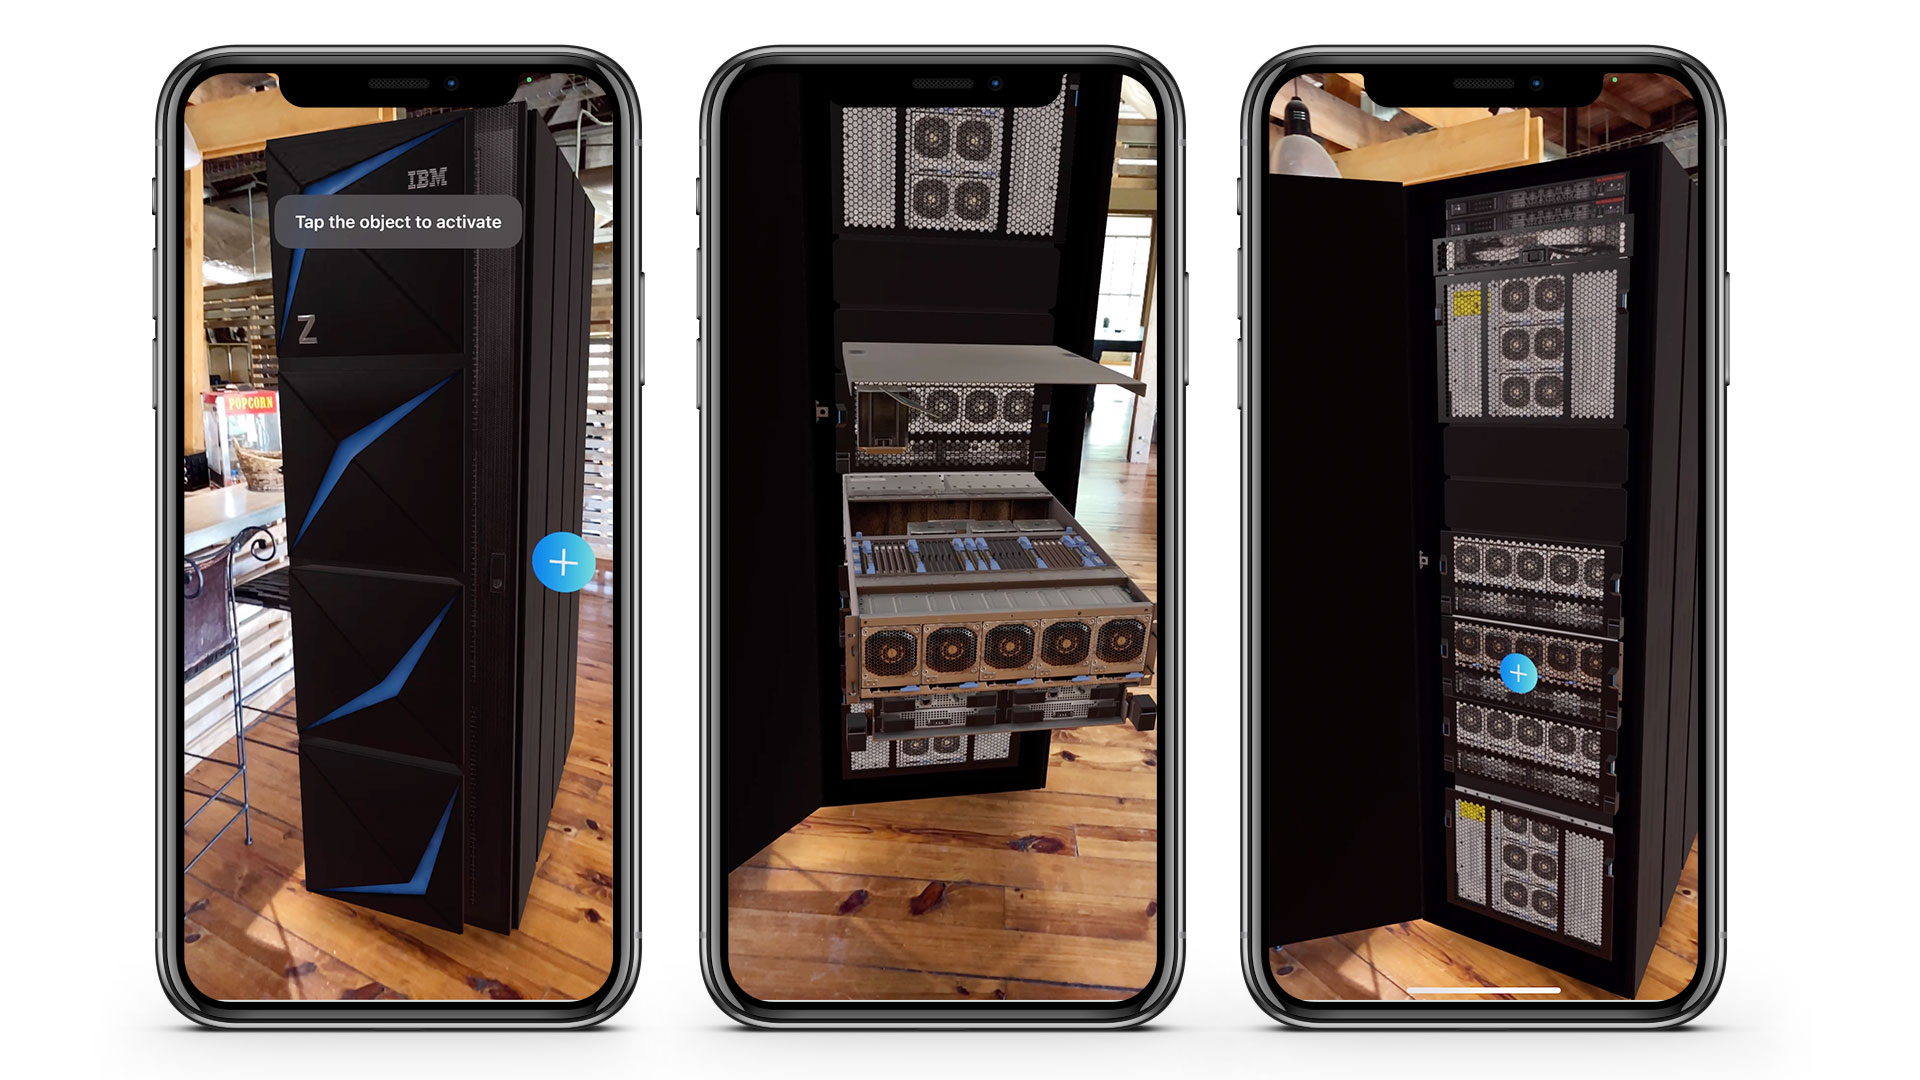 IBM Z Augmented reality